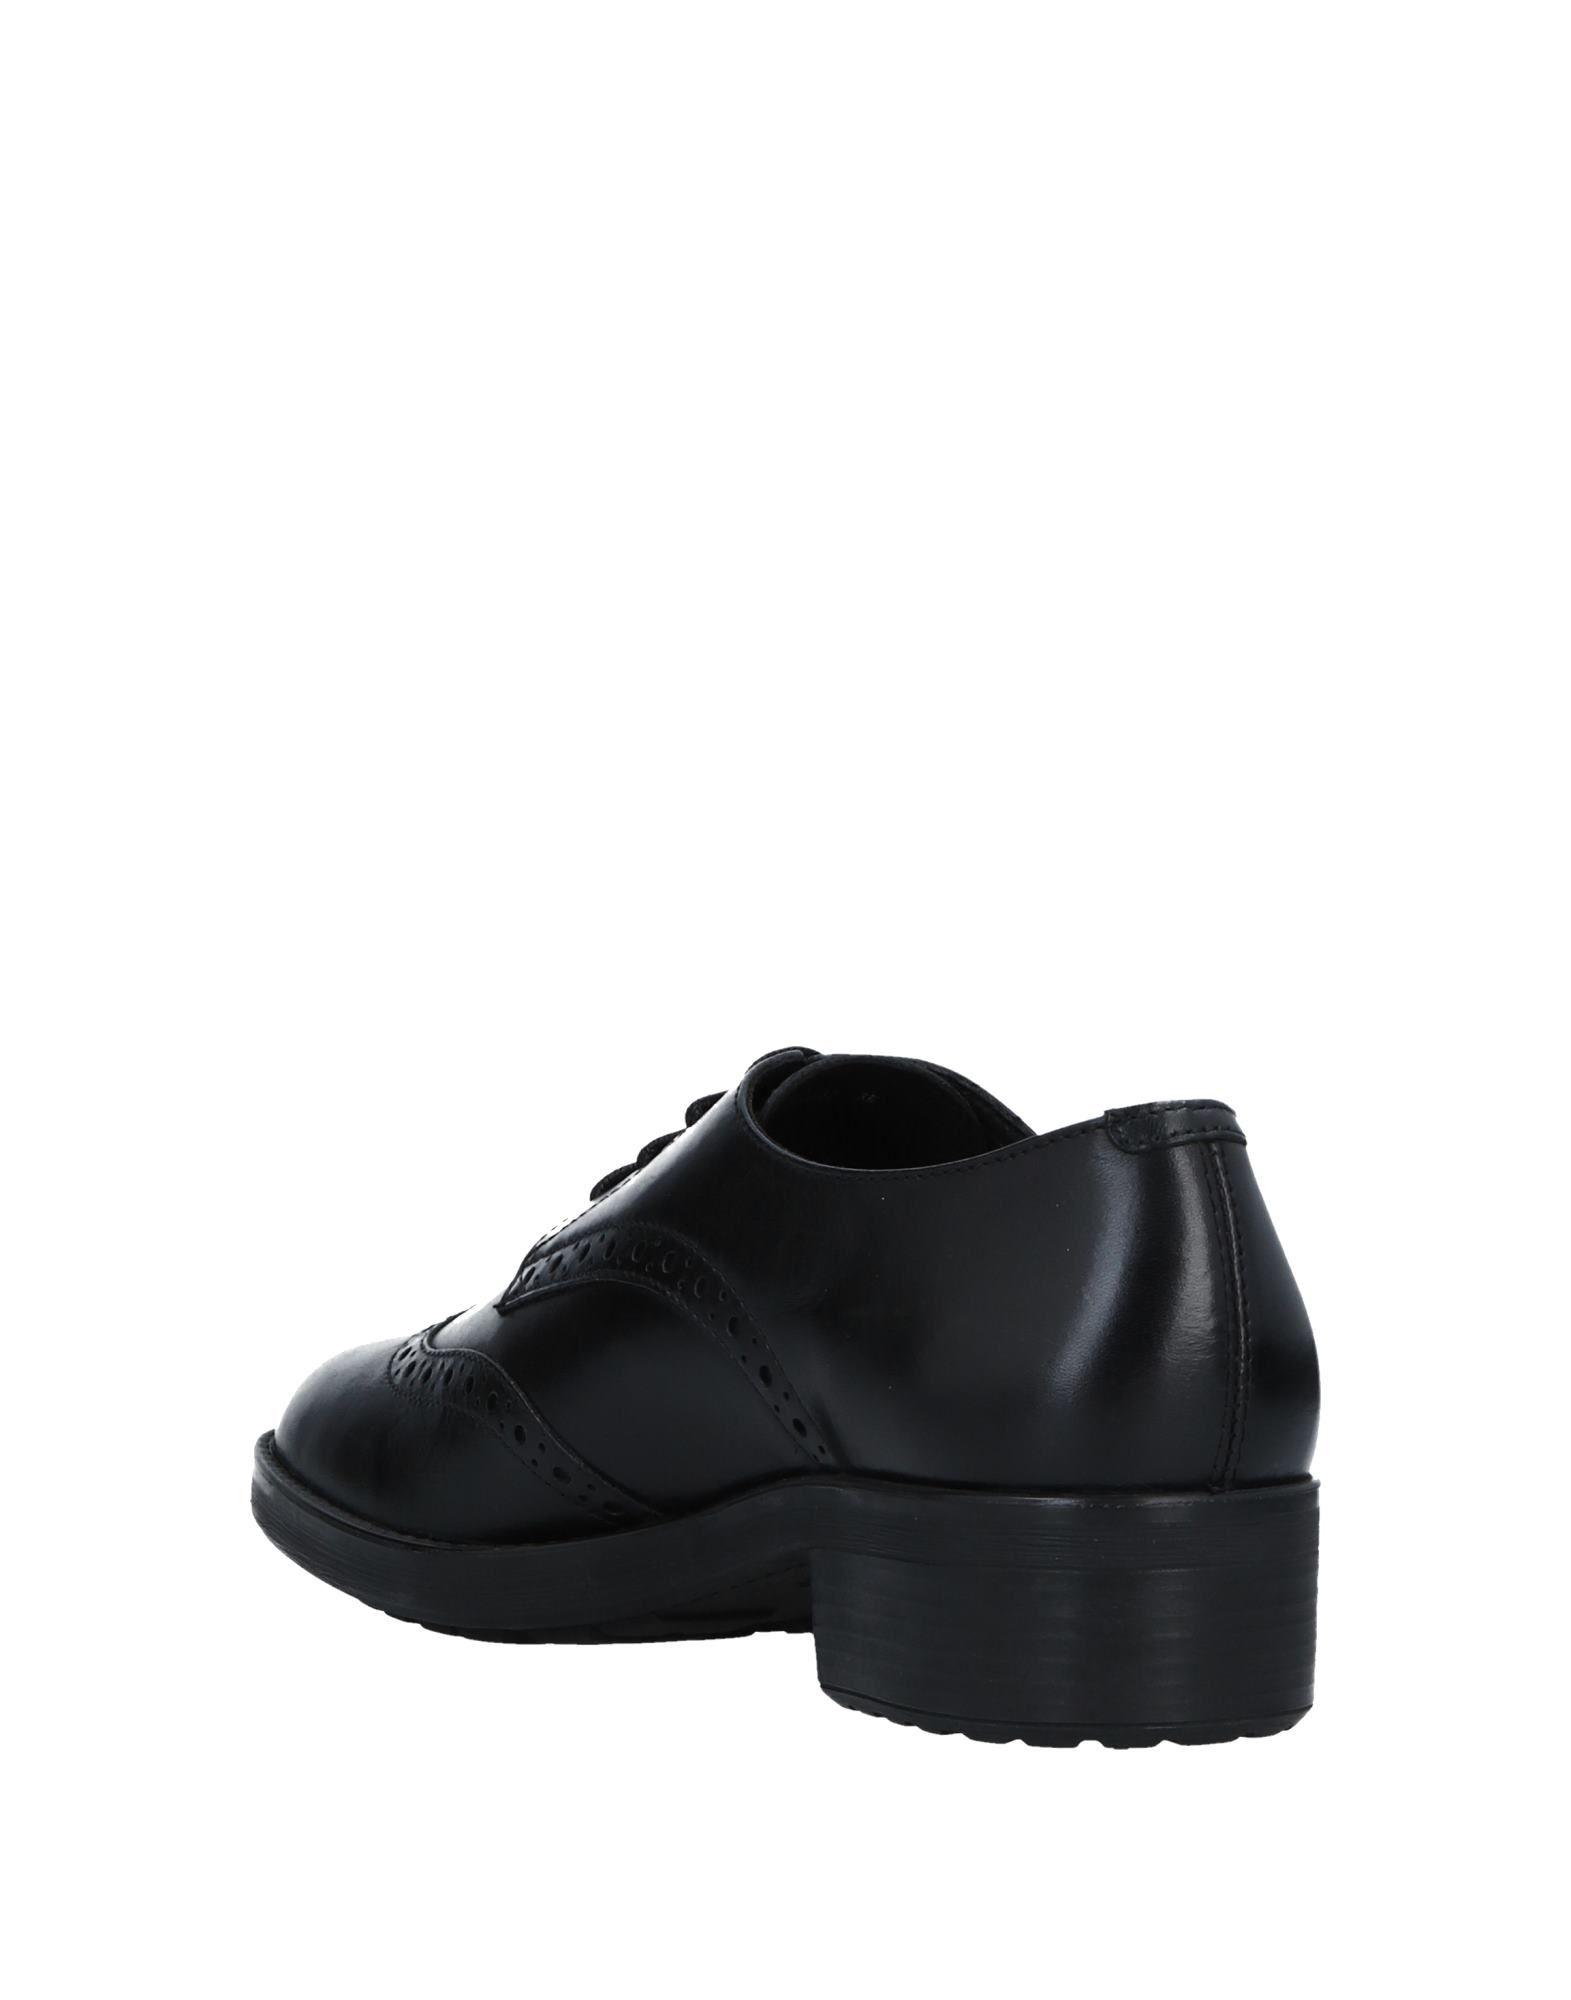 Geox Gute Schnürschuhe Damen  11539443MG Gute Geox Qualität beliebte Schuhe 581919